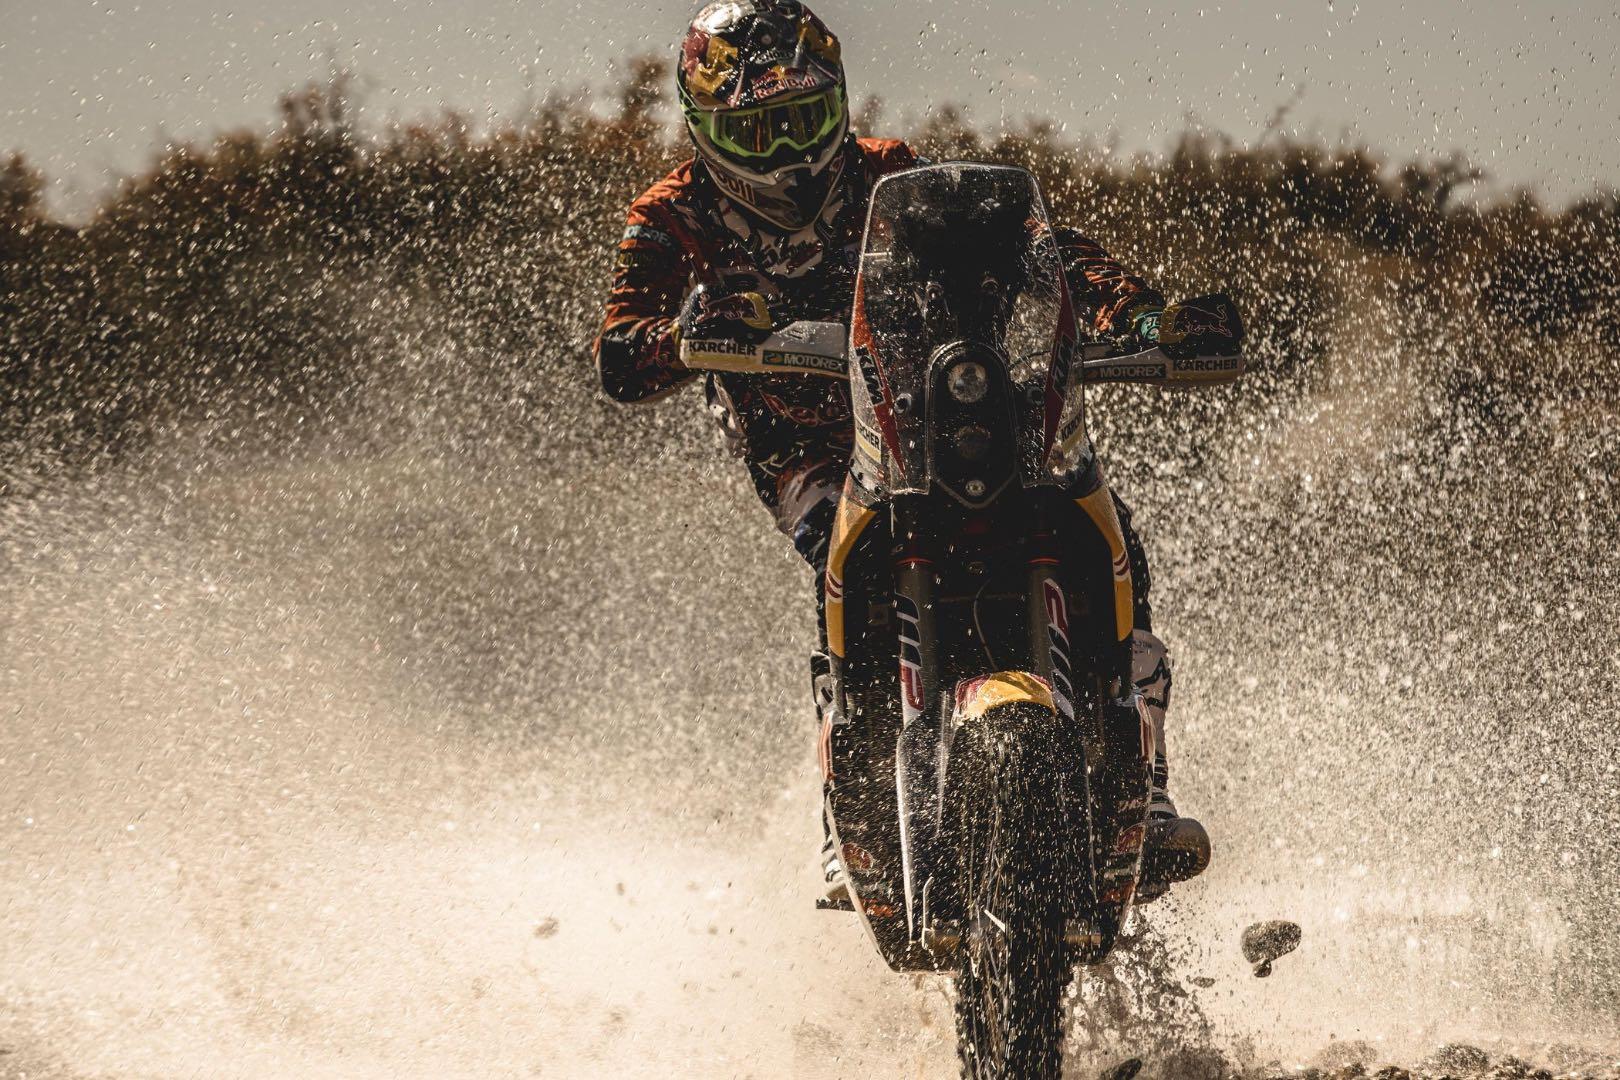 KTM's Matthias Walkner heads to Dakar Rally